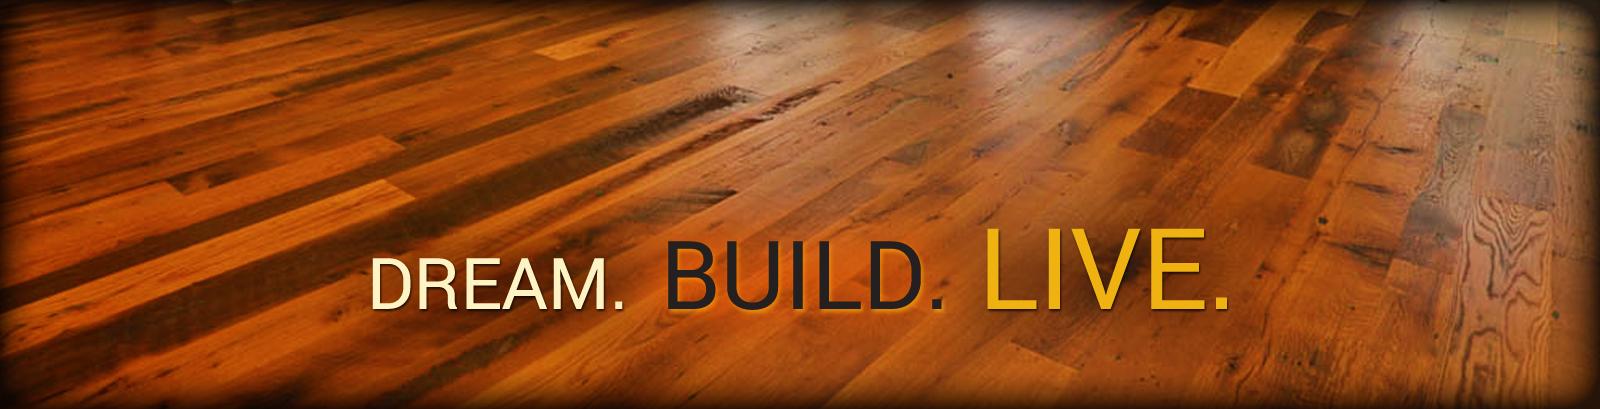 Live. Build. Dream